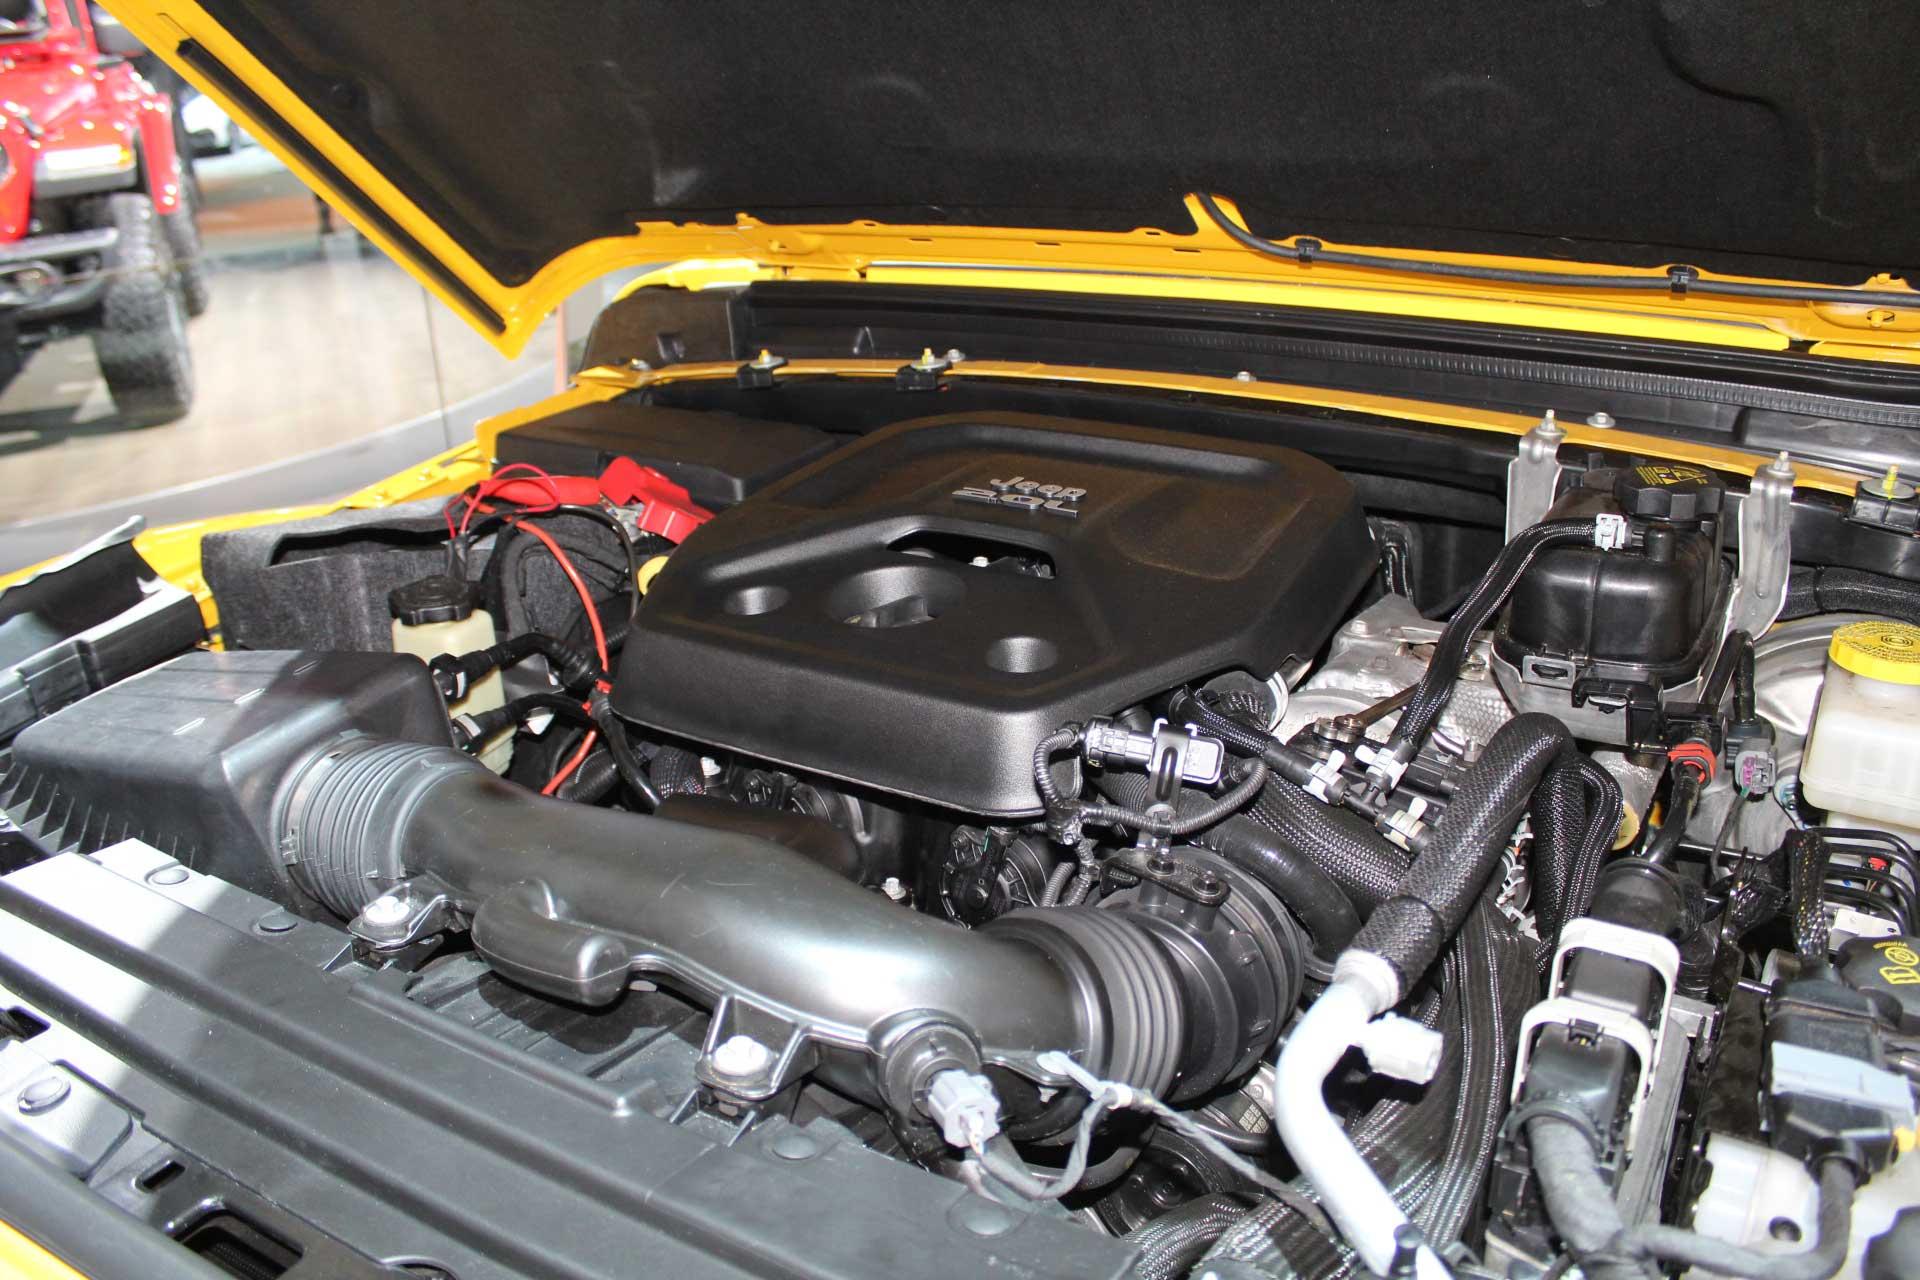 2018 Jeep Wrangler Jl Parts Vehicle Information Onallcylinders Front Suspension Diagram Detroit Auto Show 2 Liter